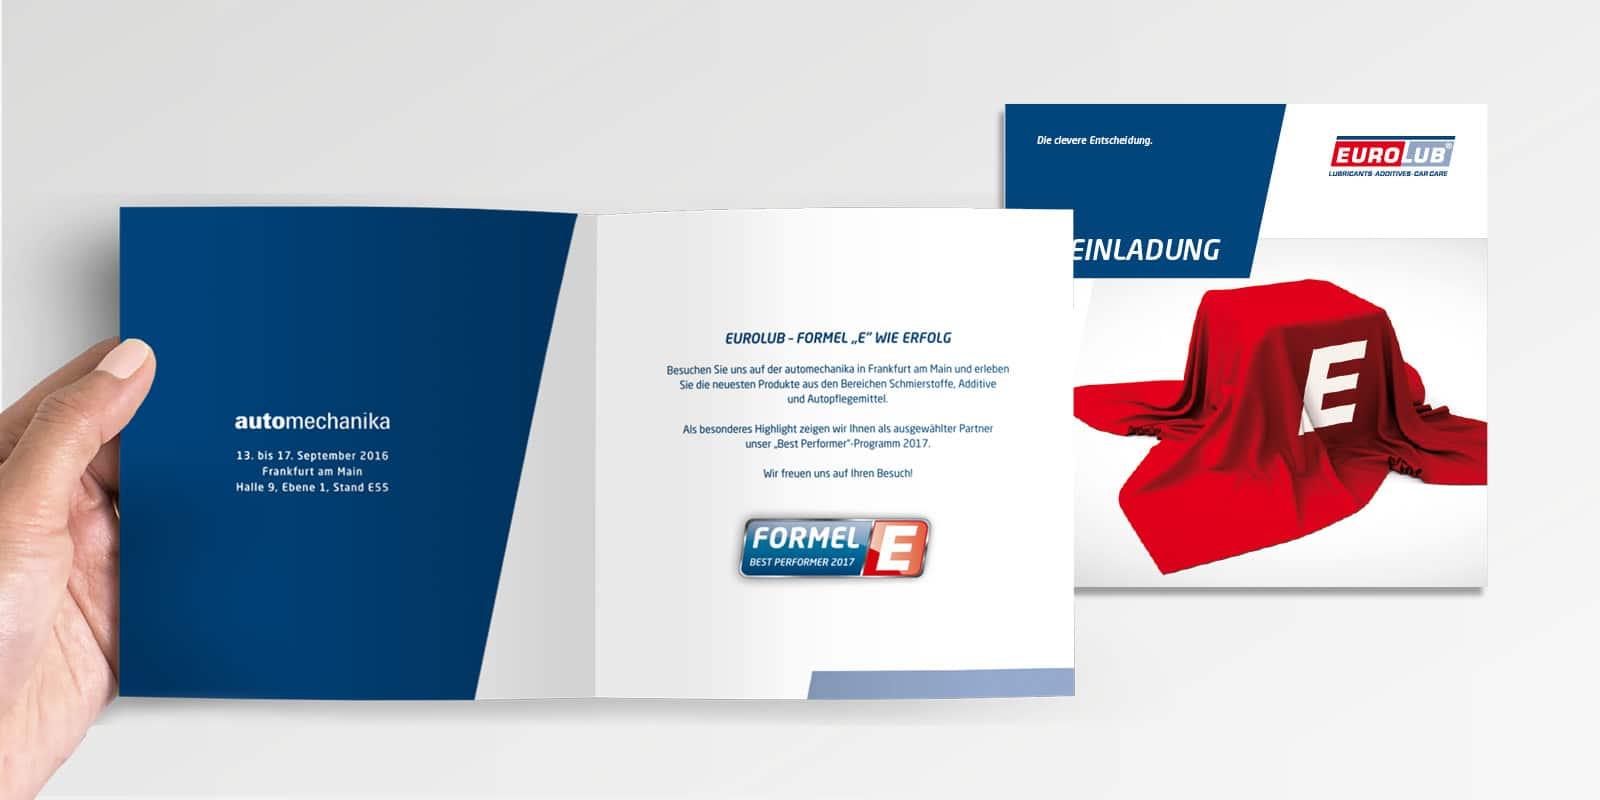 Eurolub – Einladung Automechanica